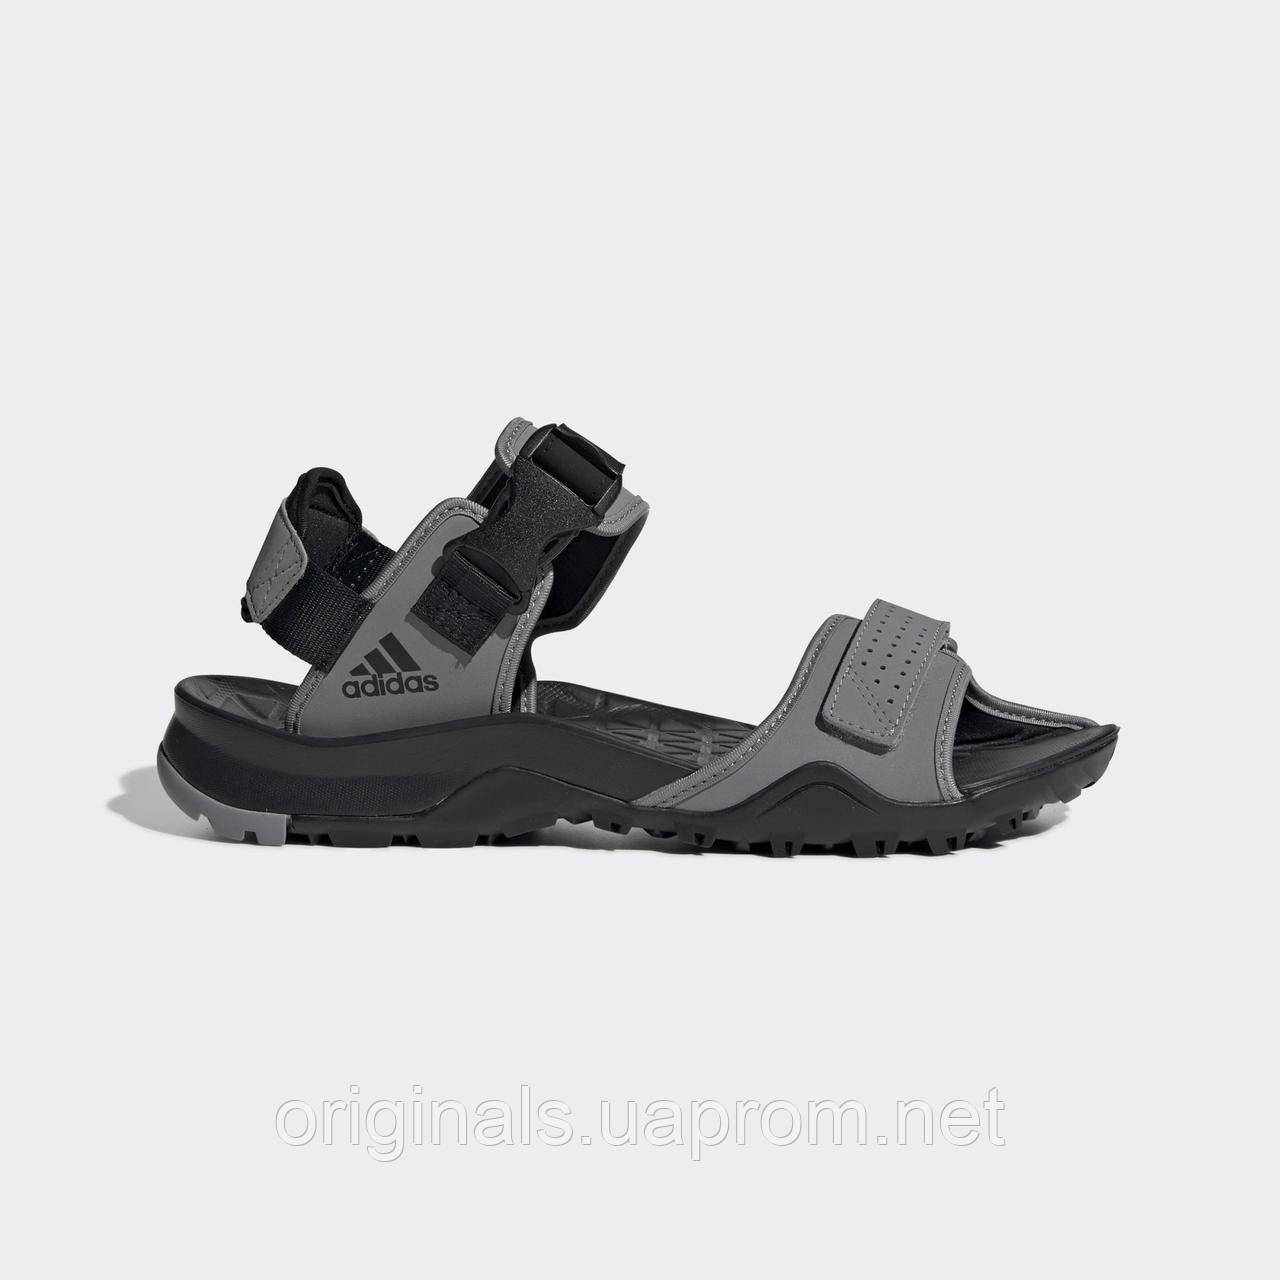 Мужские сандалии Adidas Cyprex Ultra II F36369 - 2019